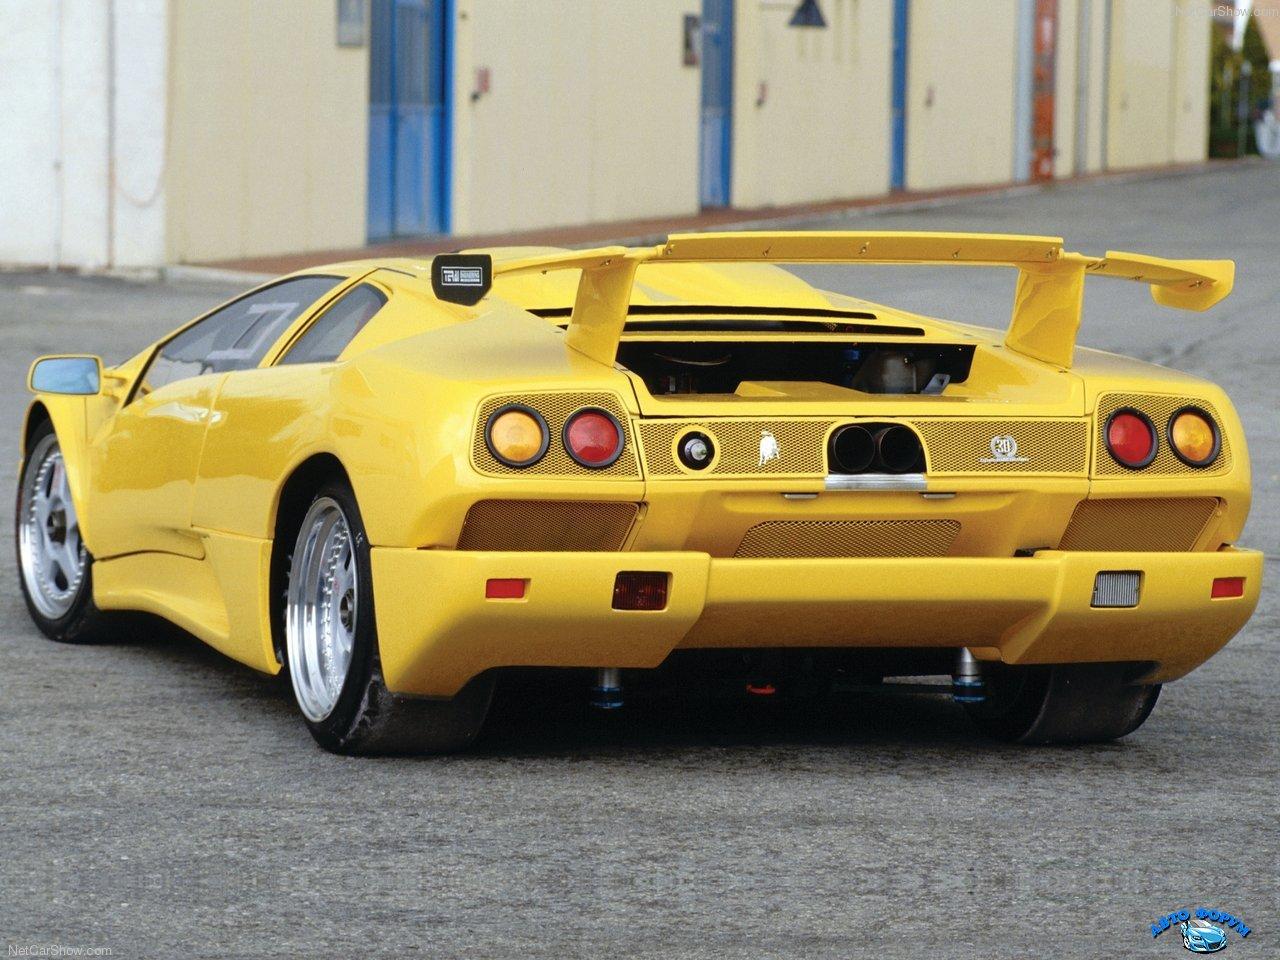 Lamborghini-Diablo_Iota_1995_1280x960_wallpaper_04.jpg